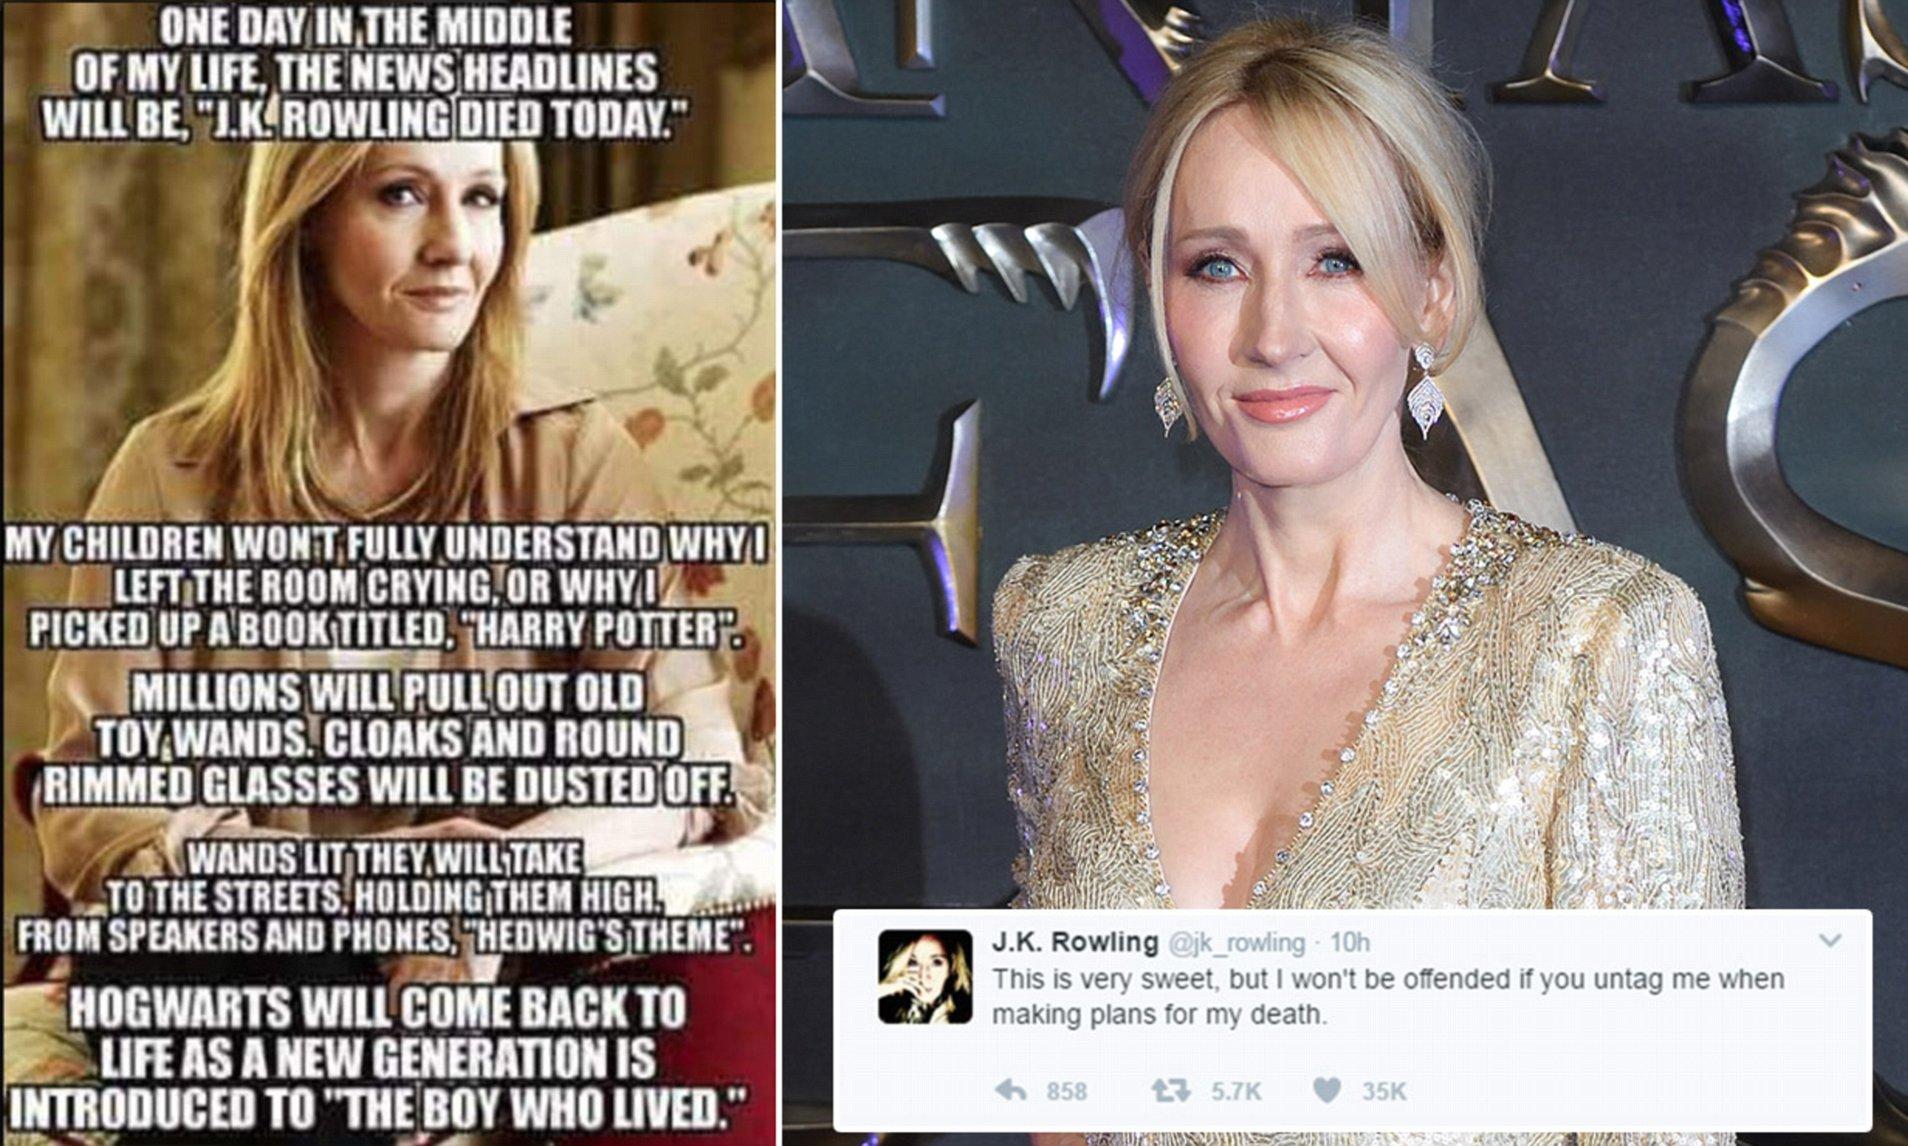 Shocked Rowling A J K Rowling Meme